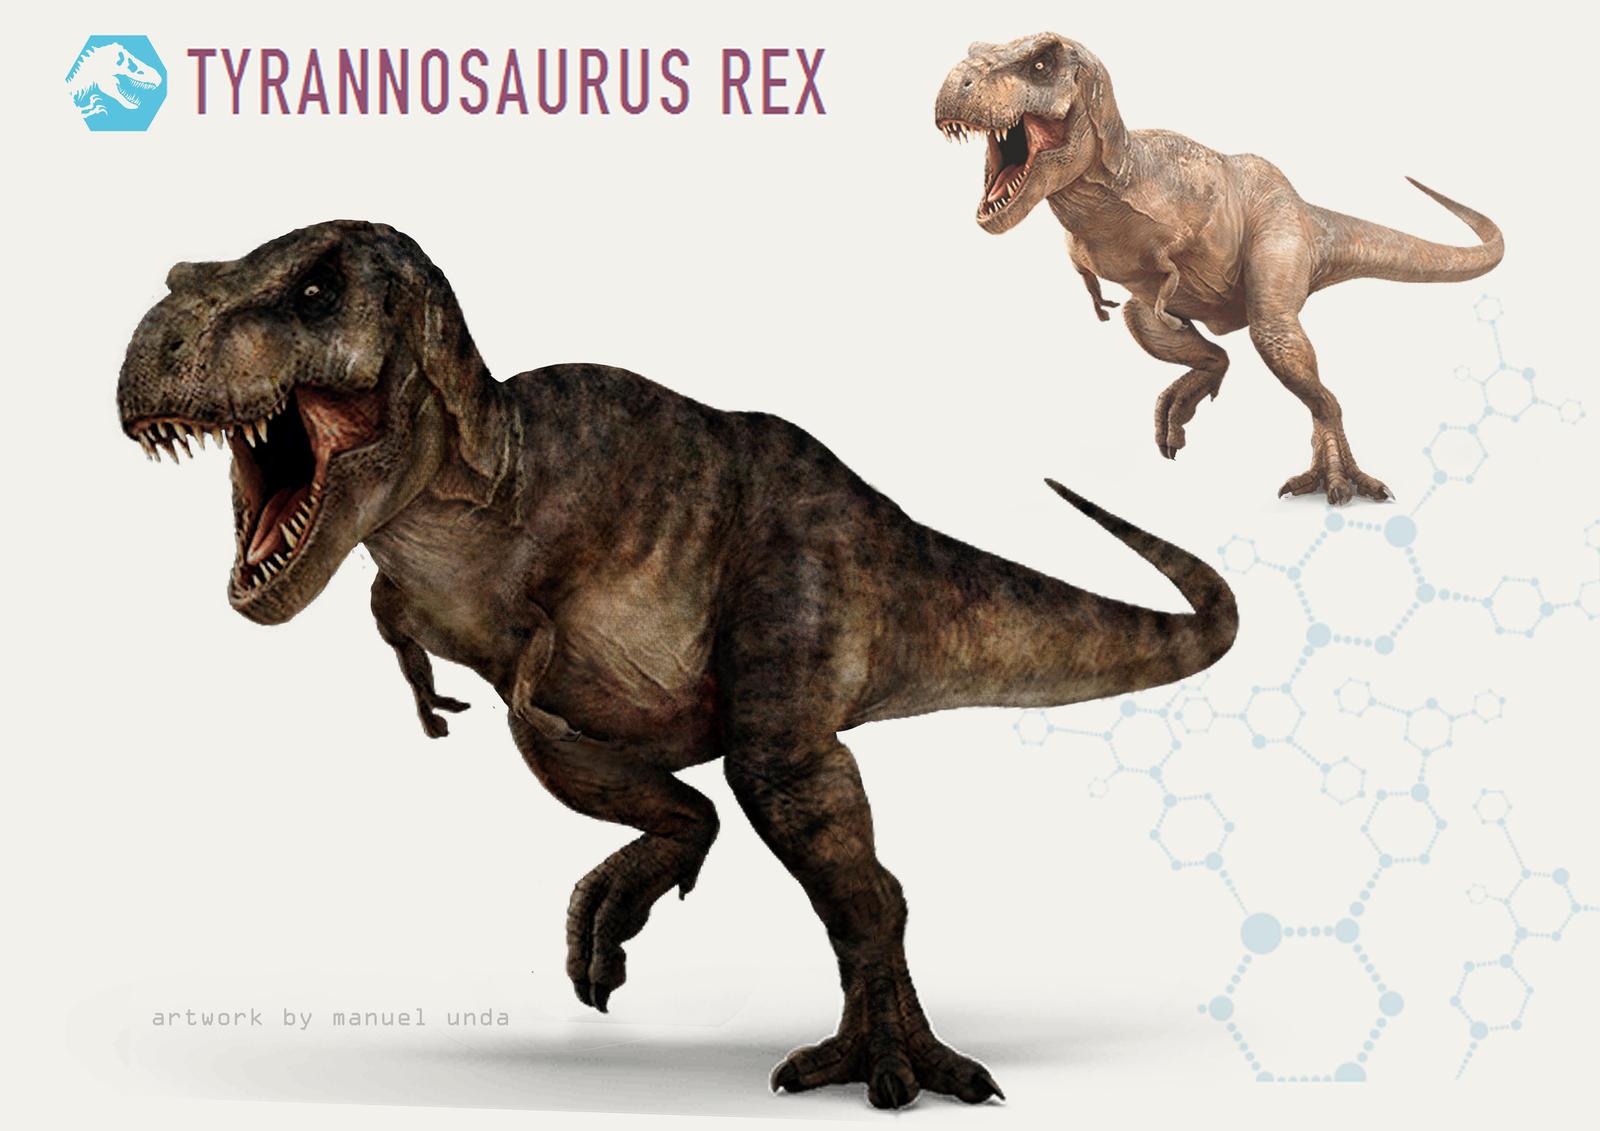 1000 Images About Jurassic World Tyrannosaurus Rex On